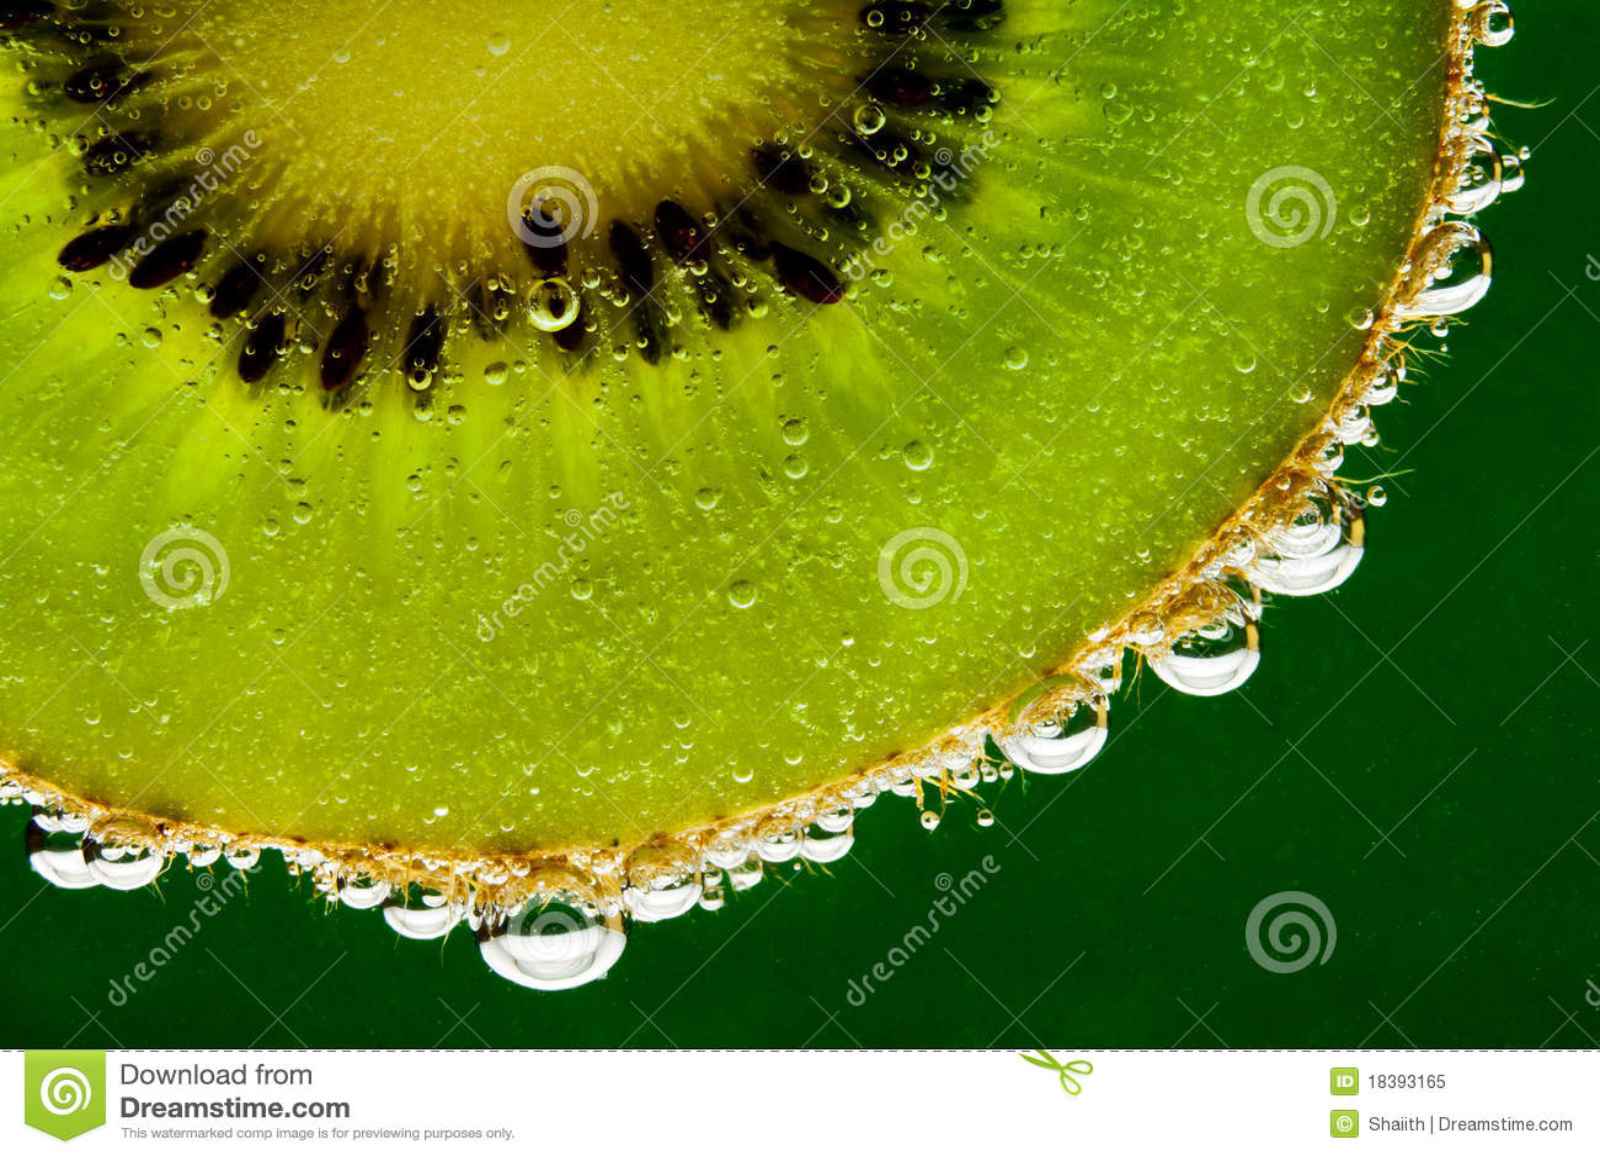 Kiwi Fruit In Sparkling Water Royalty Free Stock Photo - Image ...